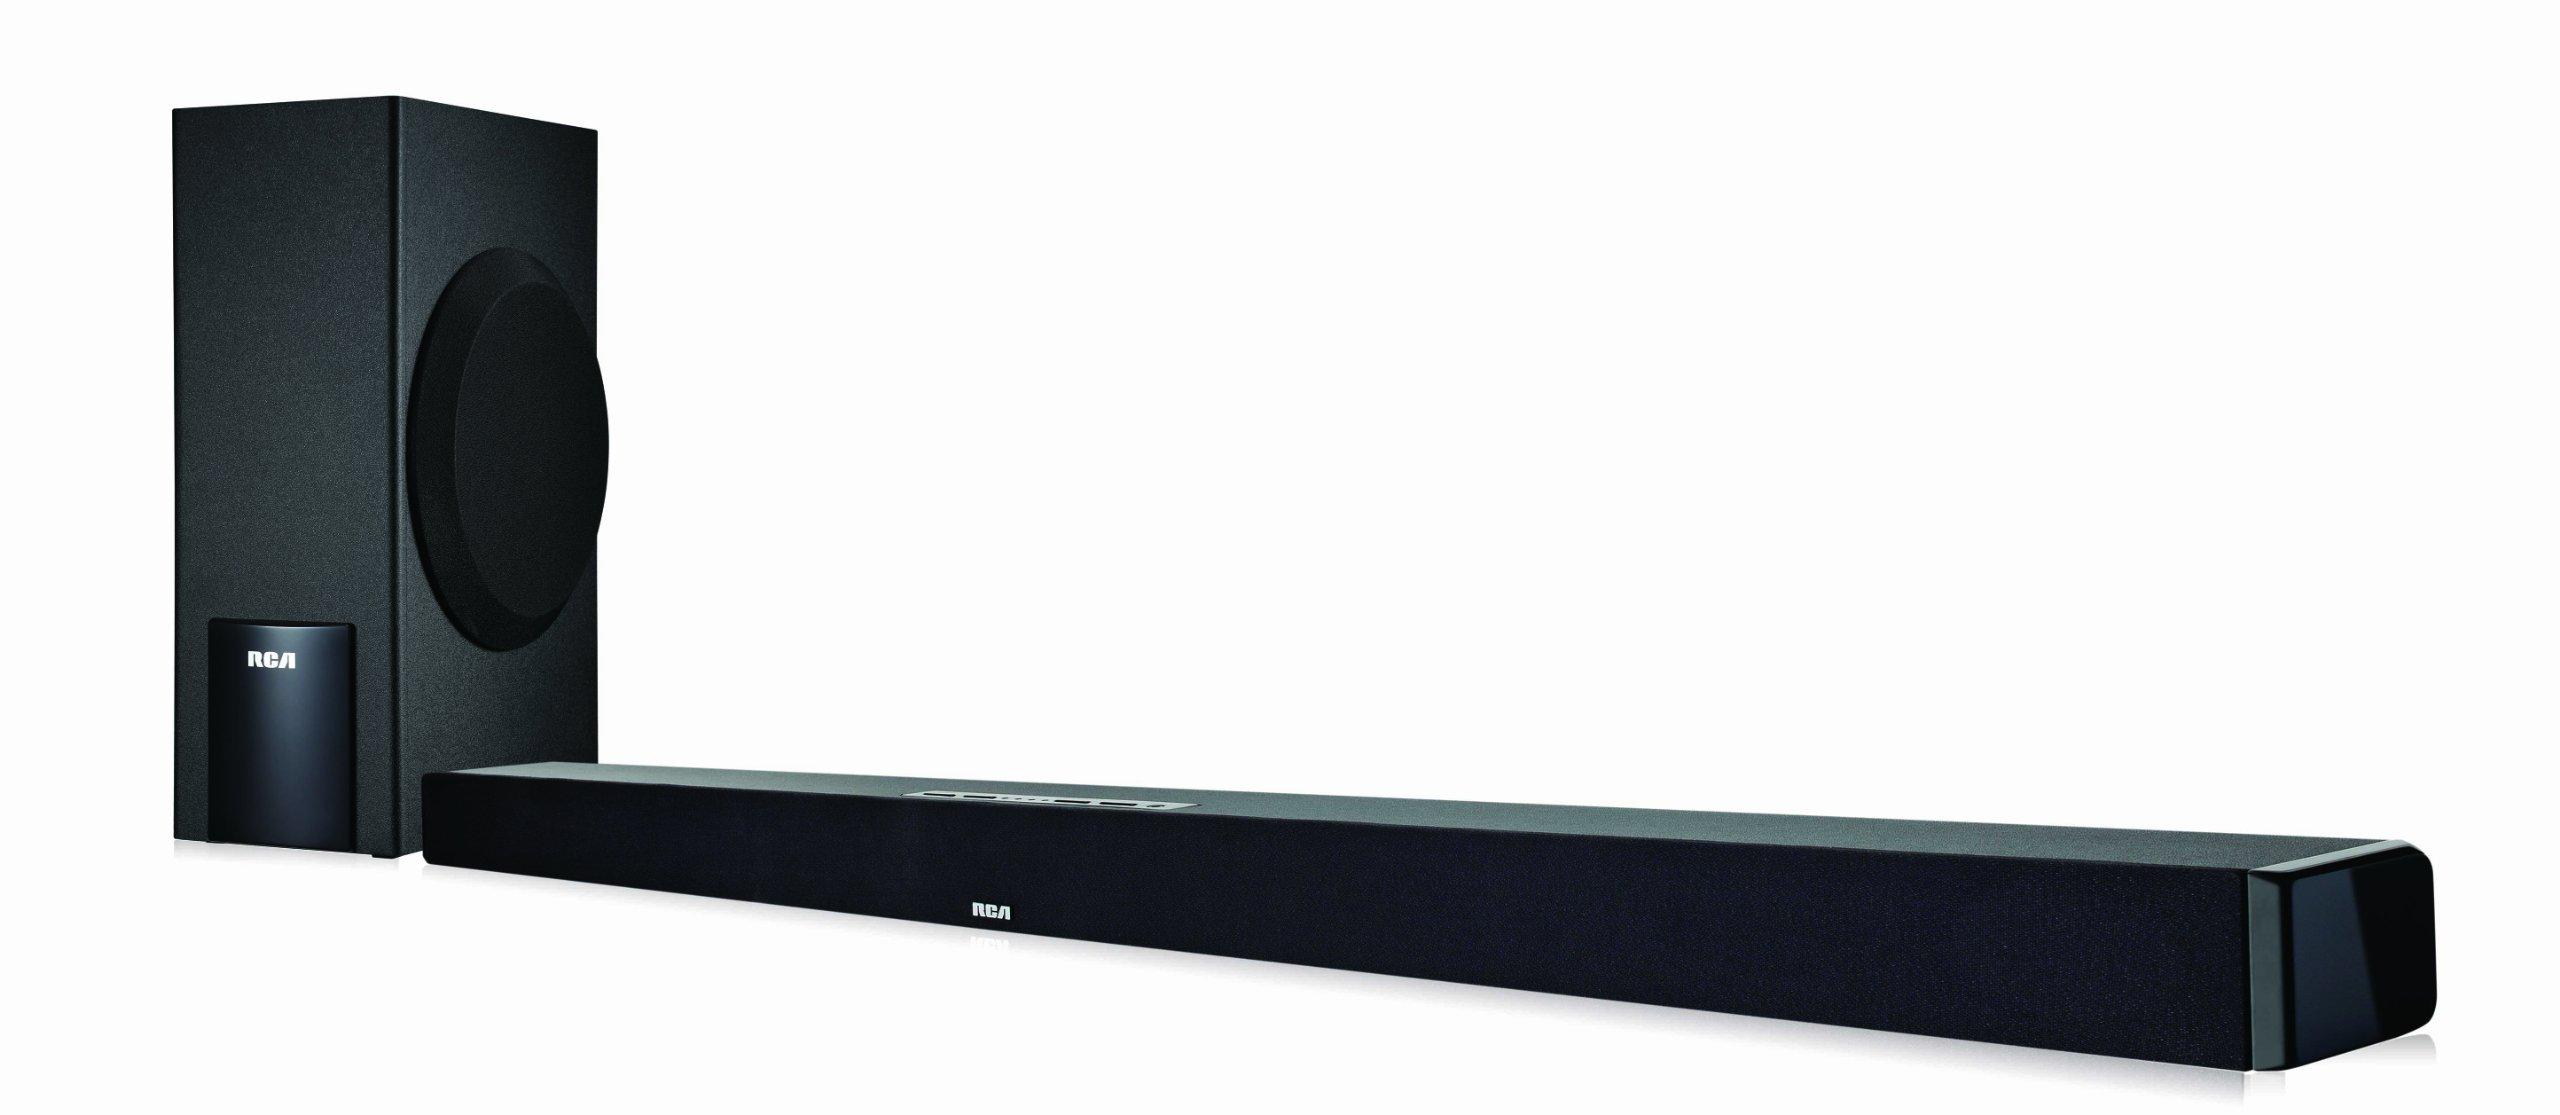 RCA RTS7340SB Bluetooth Home Theater Sound Bar (Black) by RCA